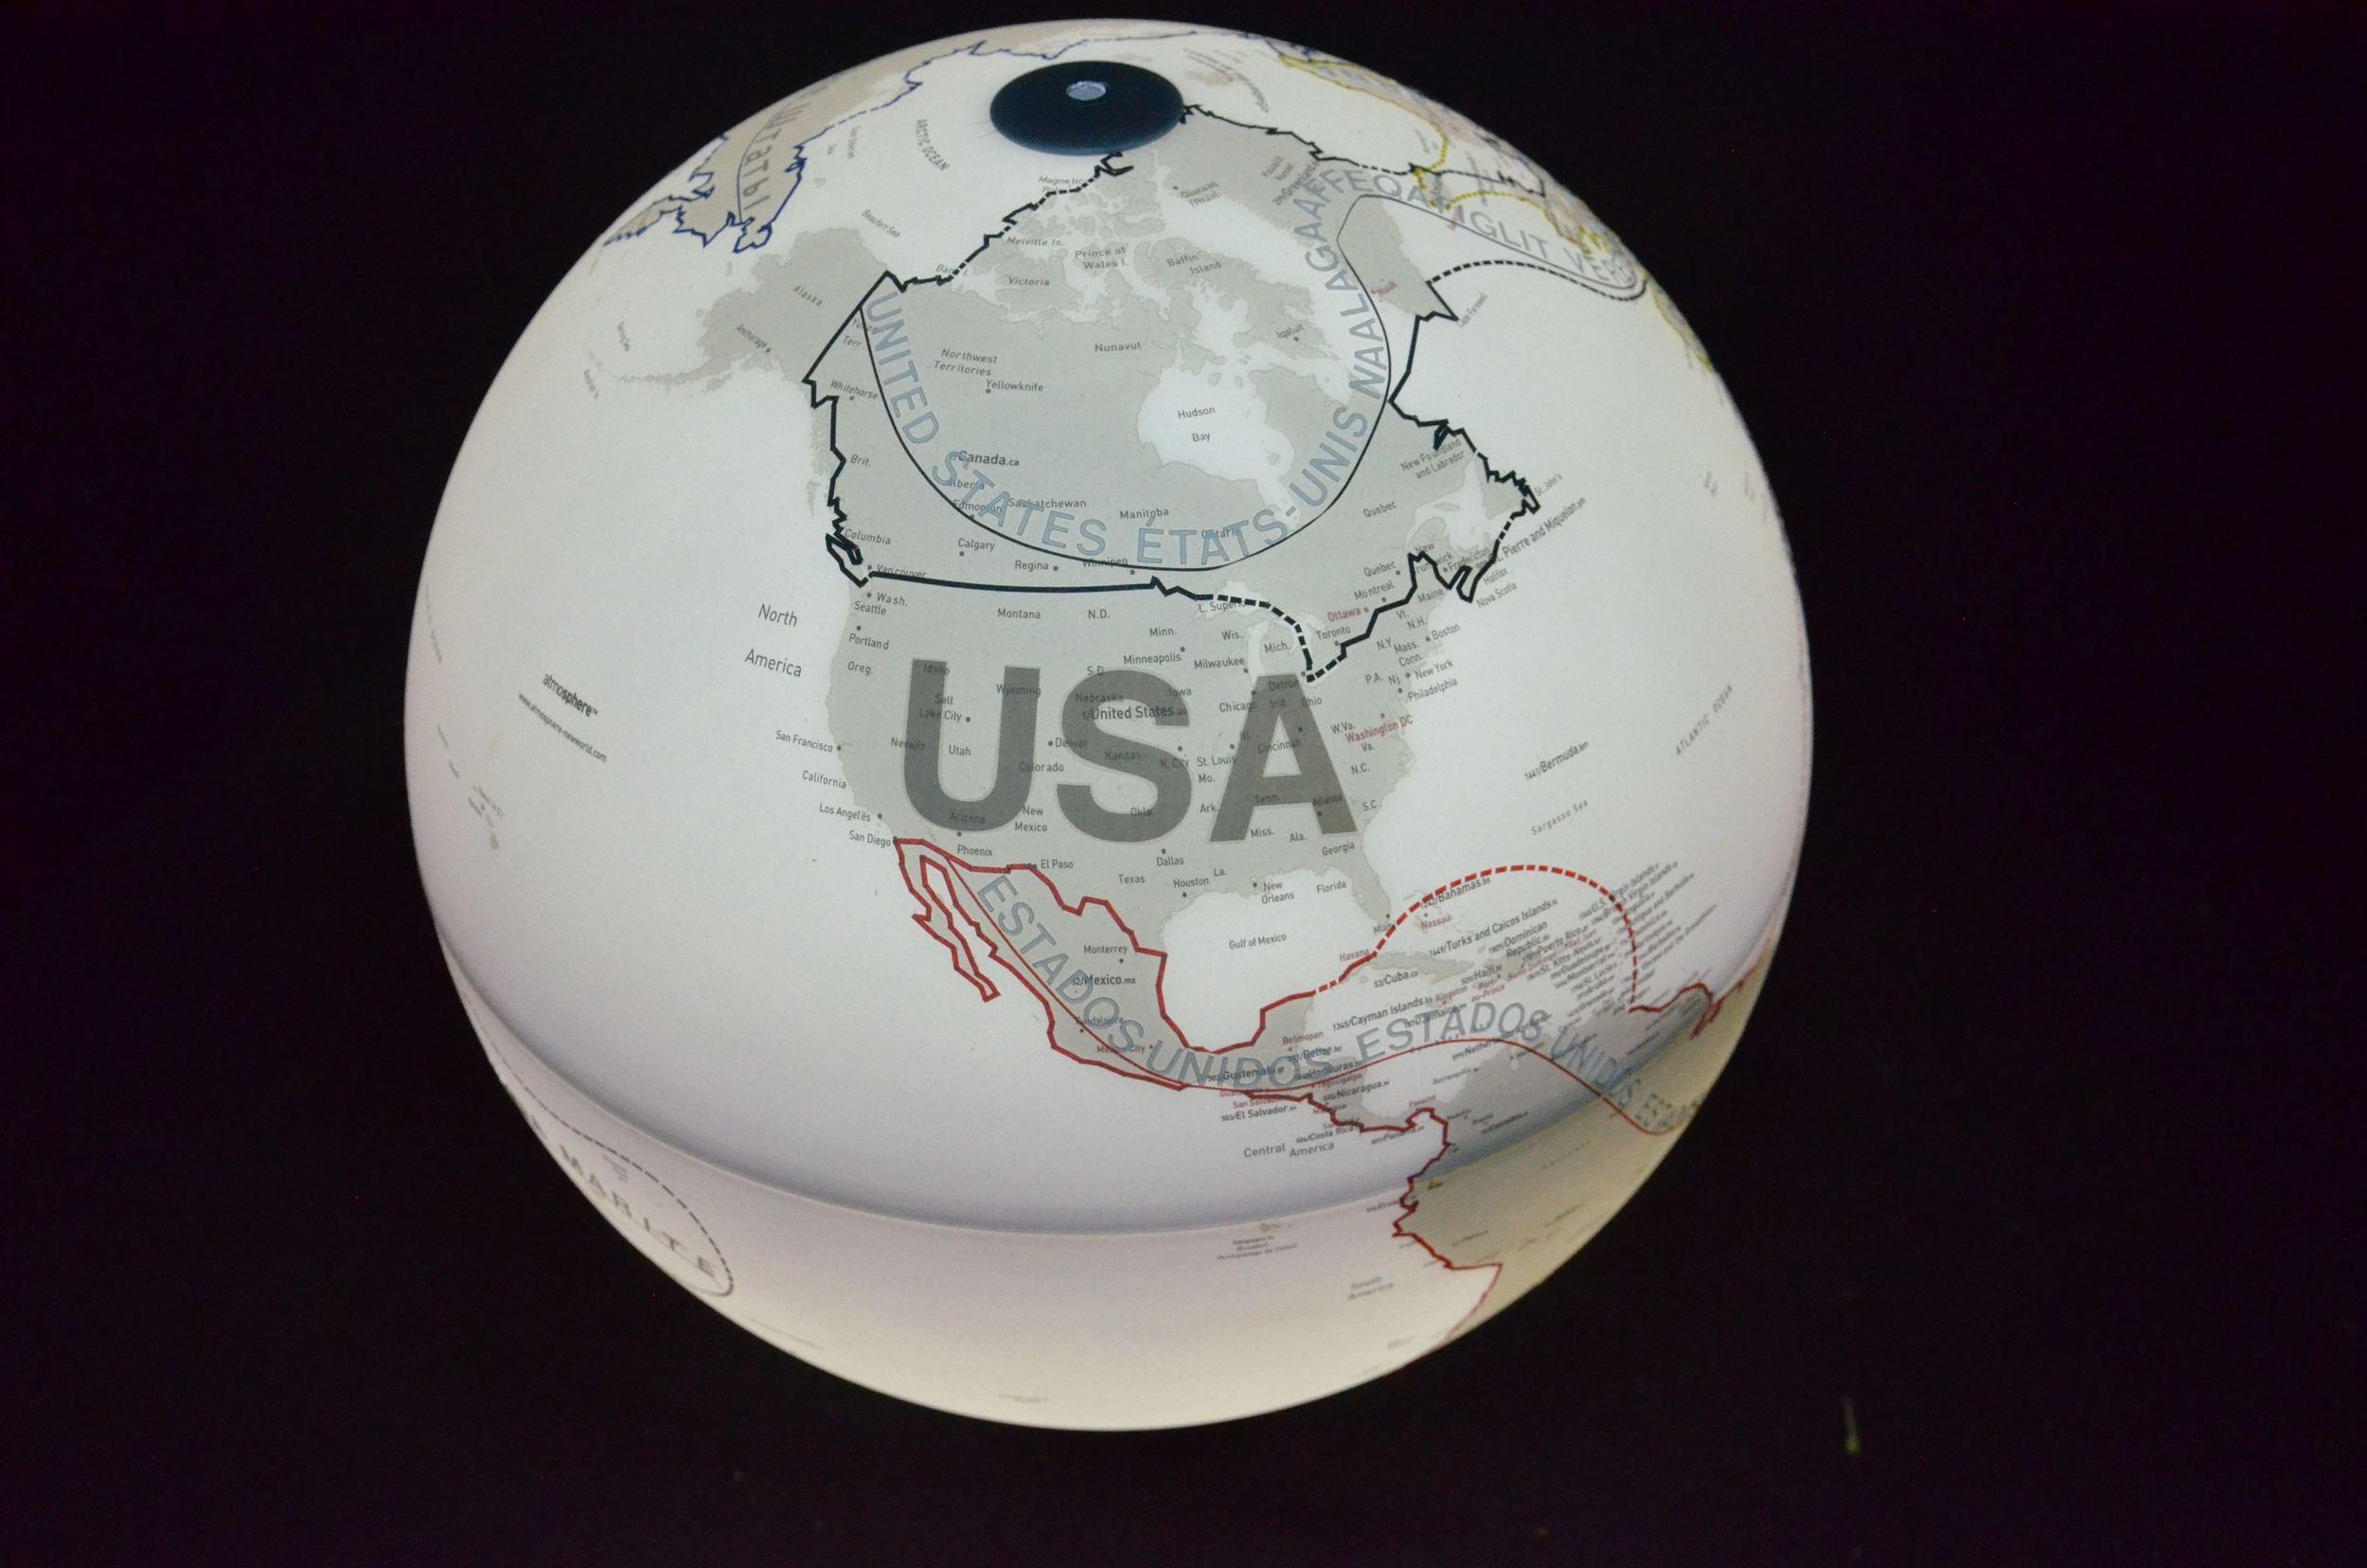 385_USA_GDP_AM_IG1_7717.jpeg